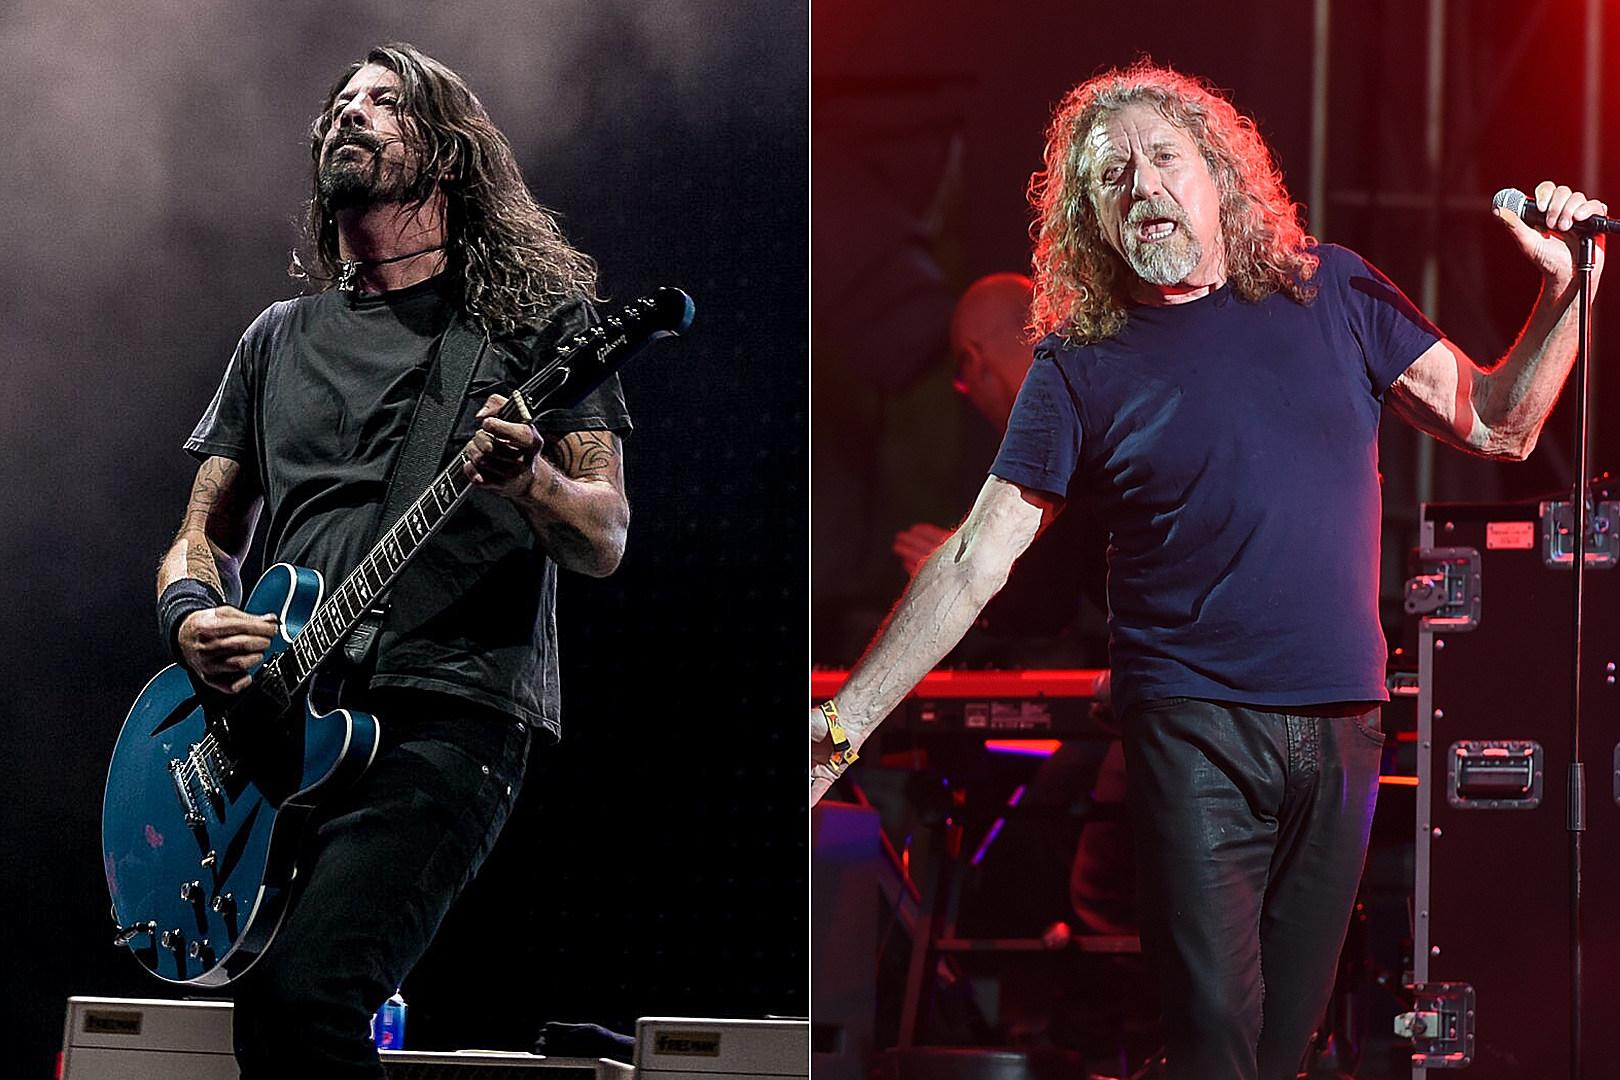 Foo Fighters, Robert Plant Lead Rock Performers at 2018 Kaaboo Festival